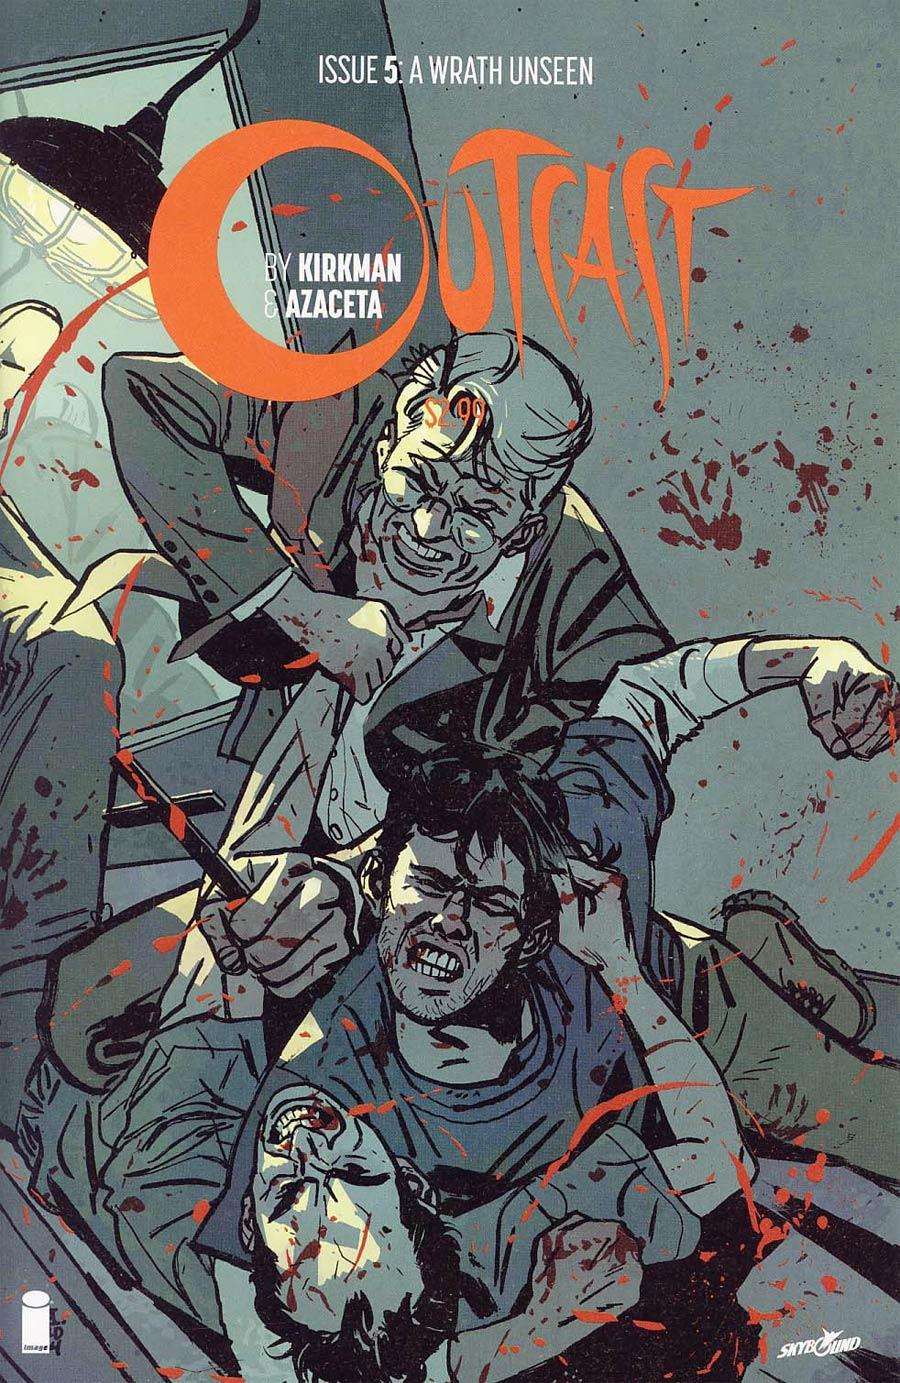 Outcast By Kirkman & Azaceta #5 Cover B 2nd Ptg